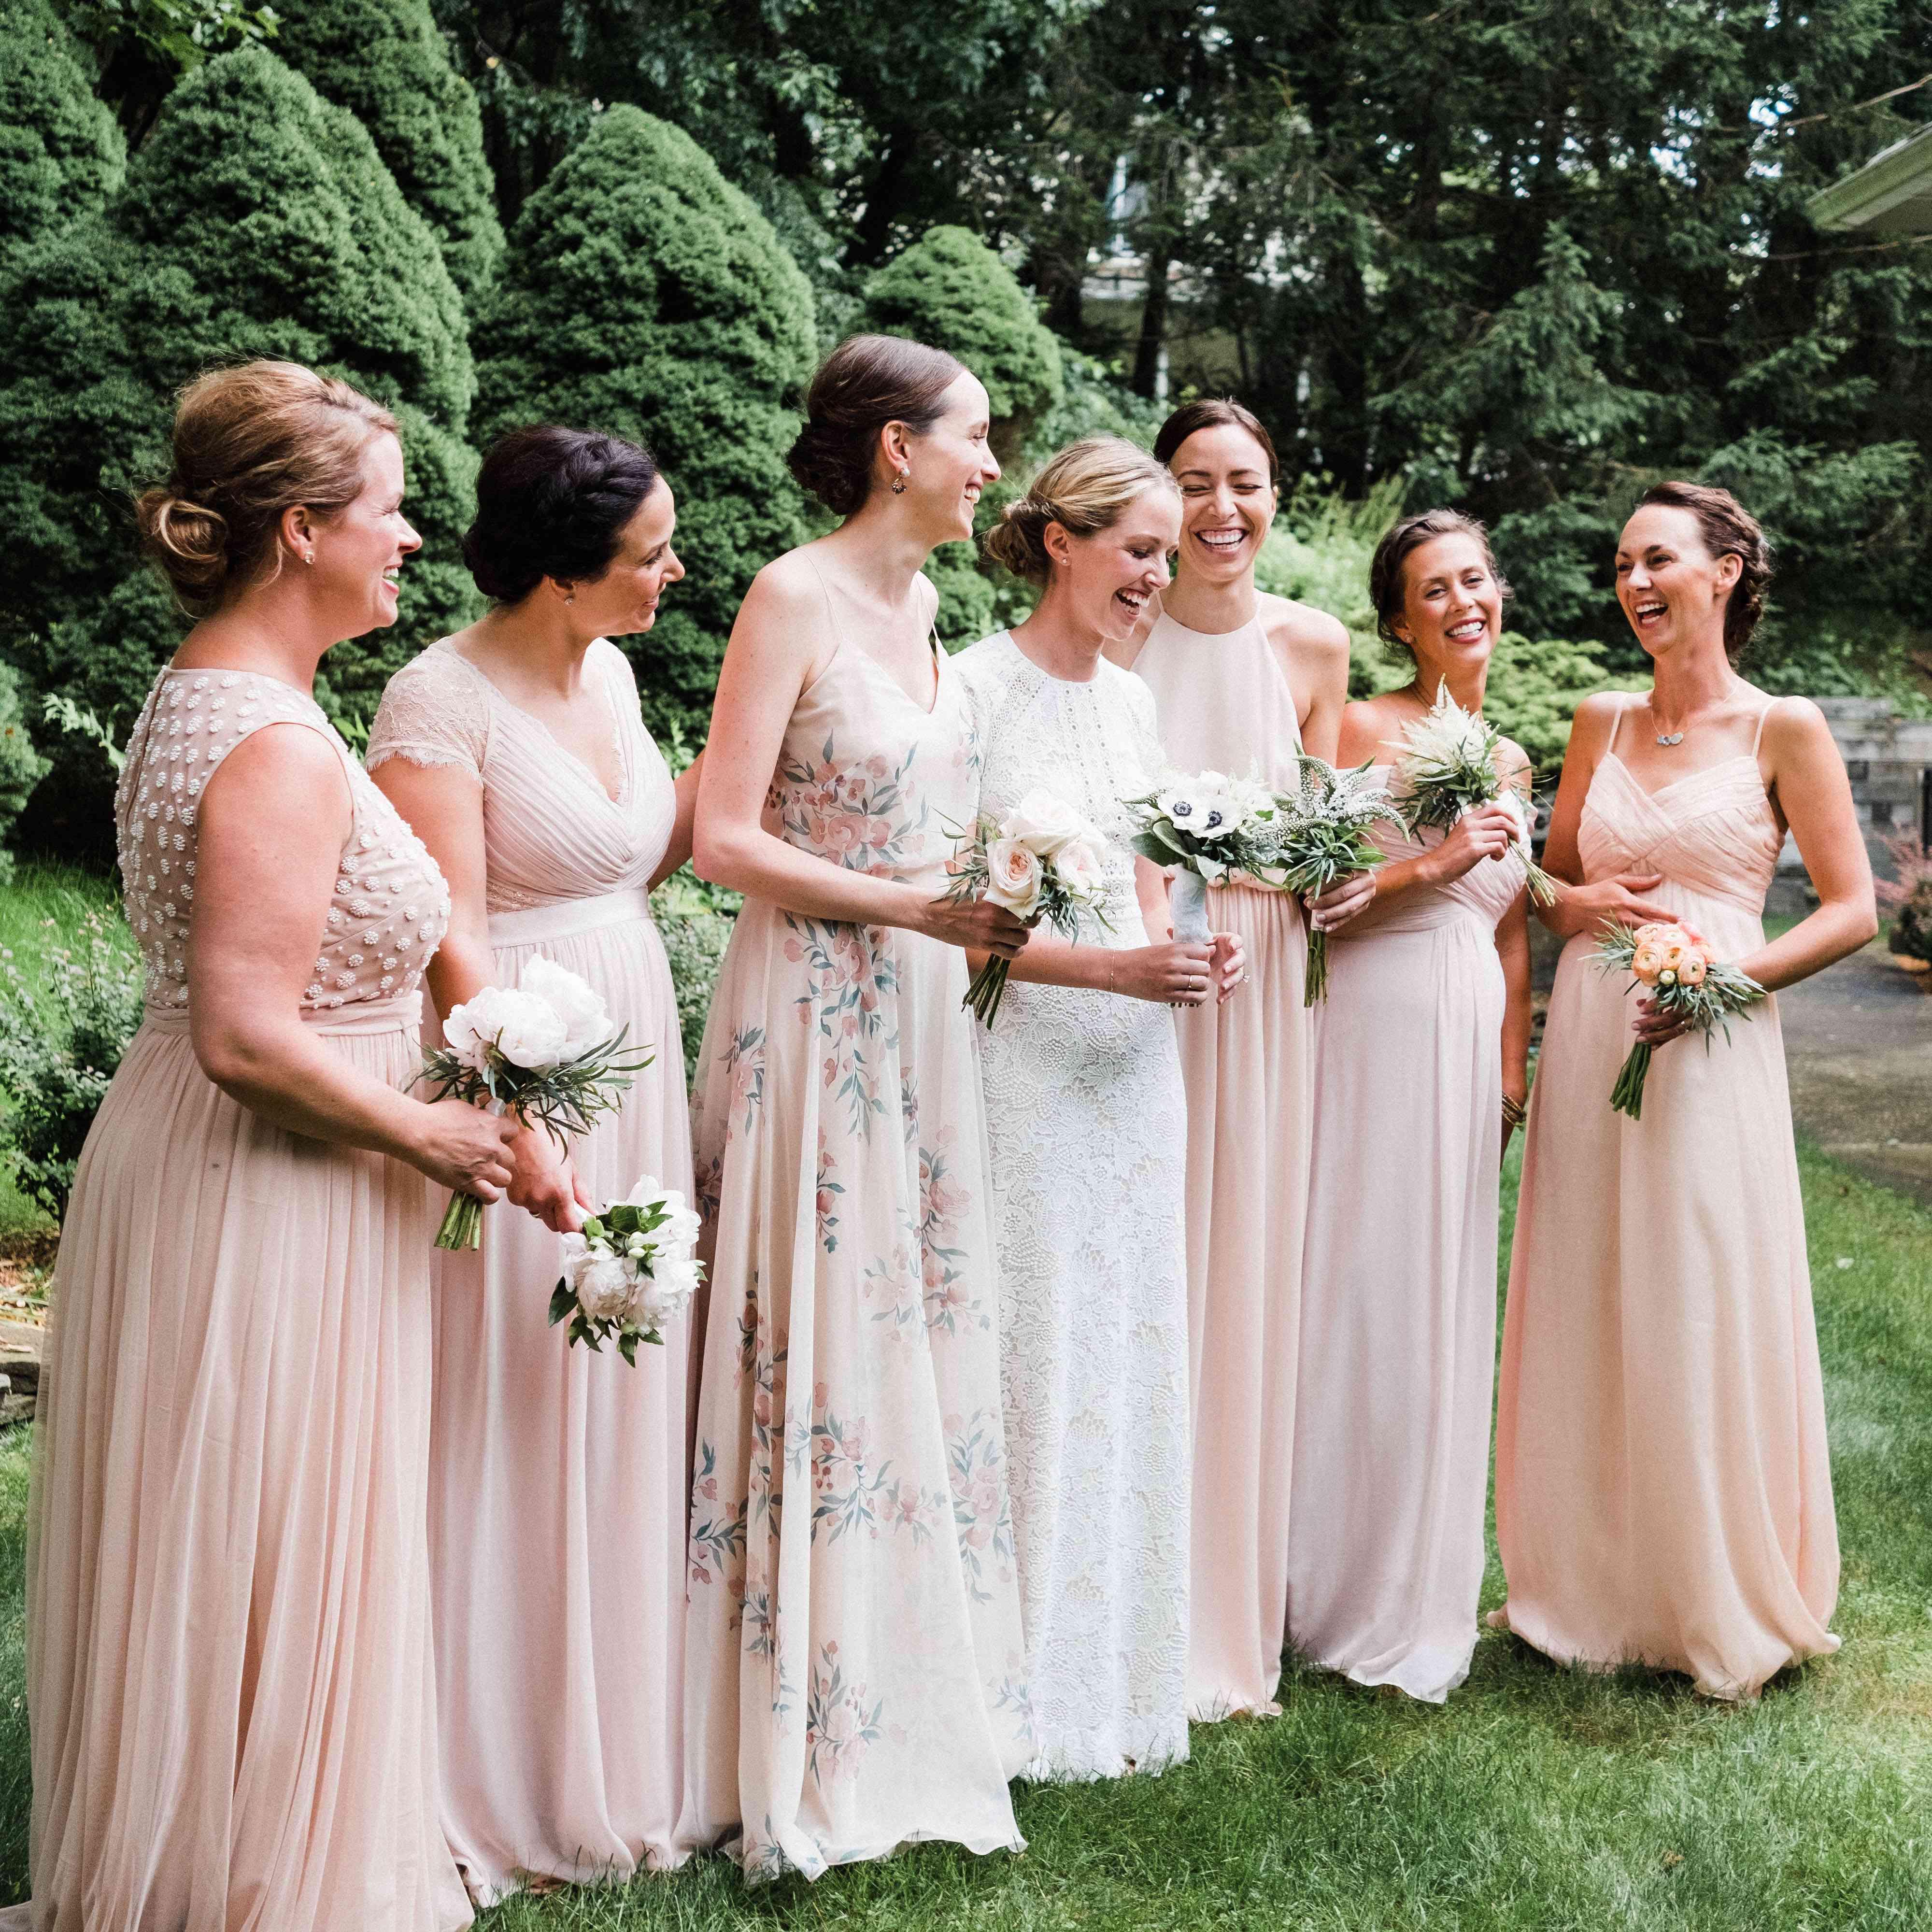 <p>bridesmaids in mismatched blush dresses</p><br><br>